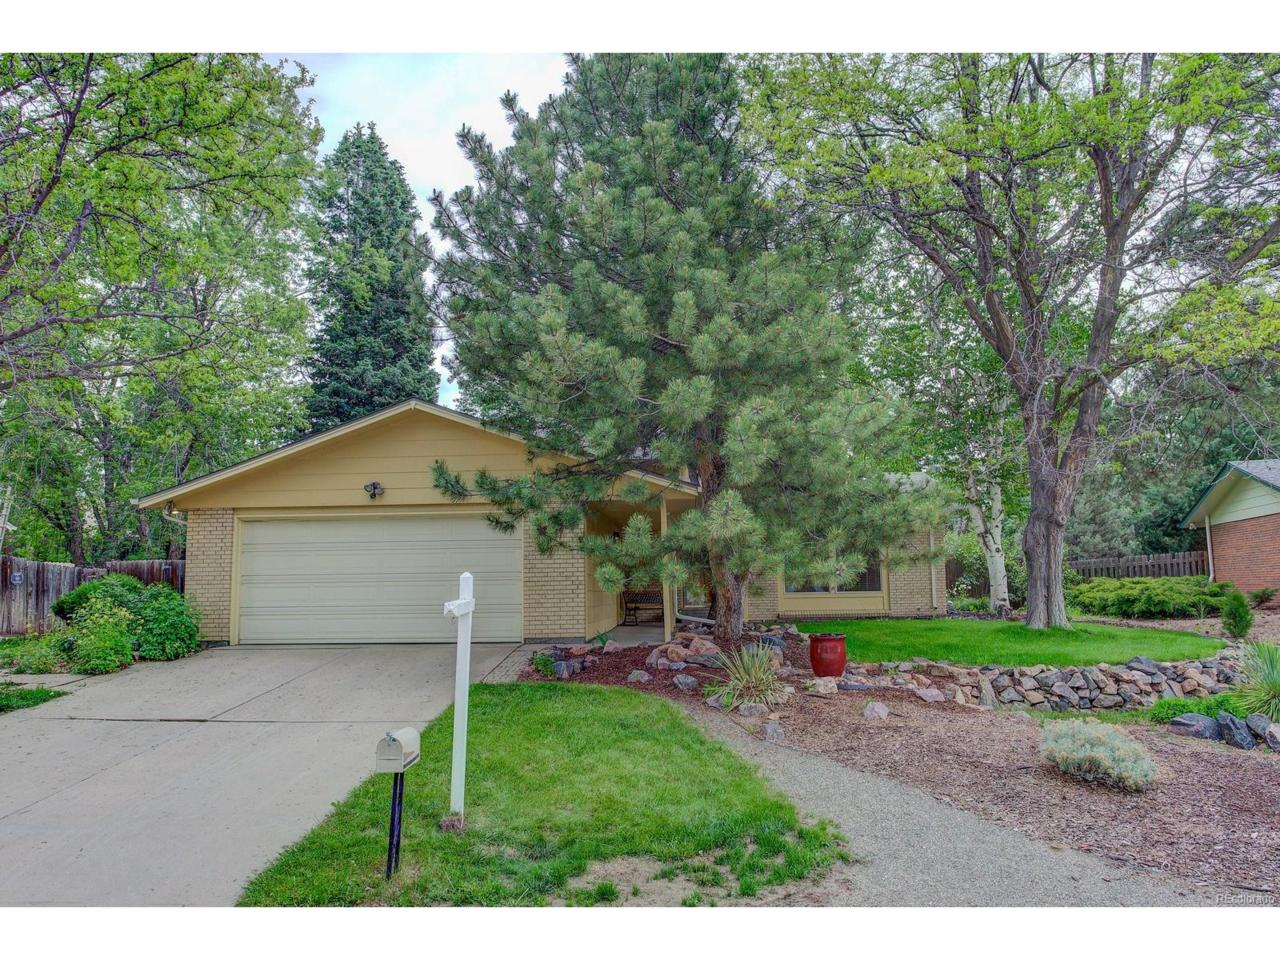 11233 E Harvard Drive, Aurora, CO 80014 (MLS #2635503) :: 8z Real Estate